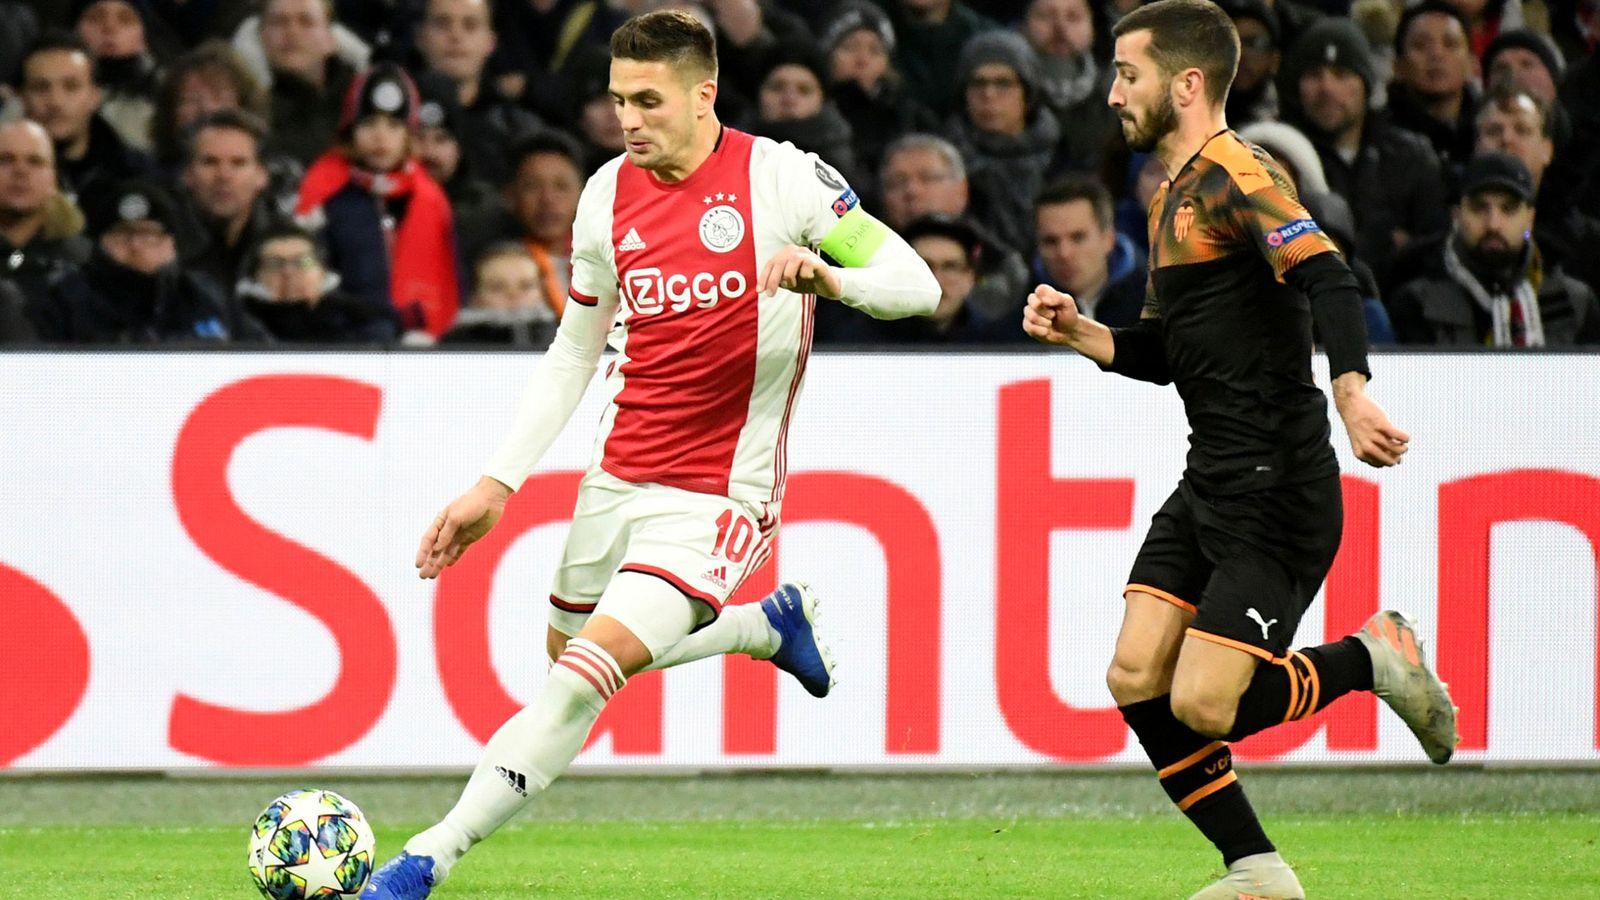 Foto: Champions league - group h - ajax amsterdam v valencia